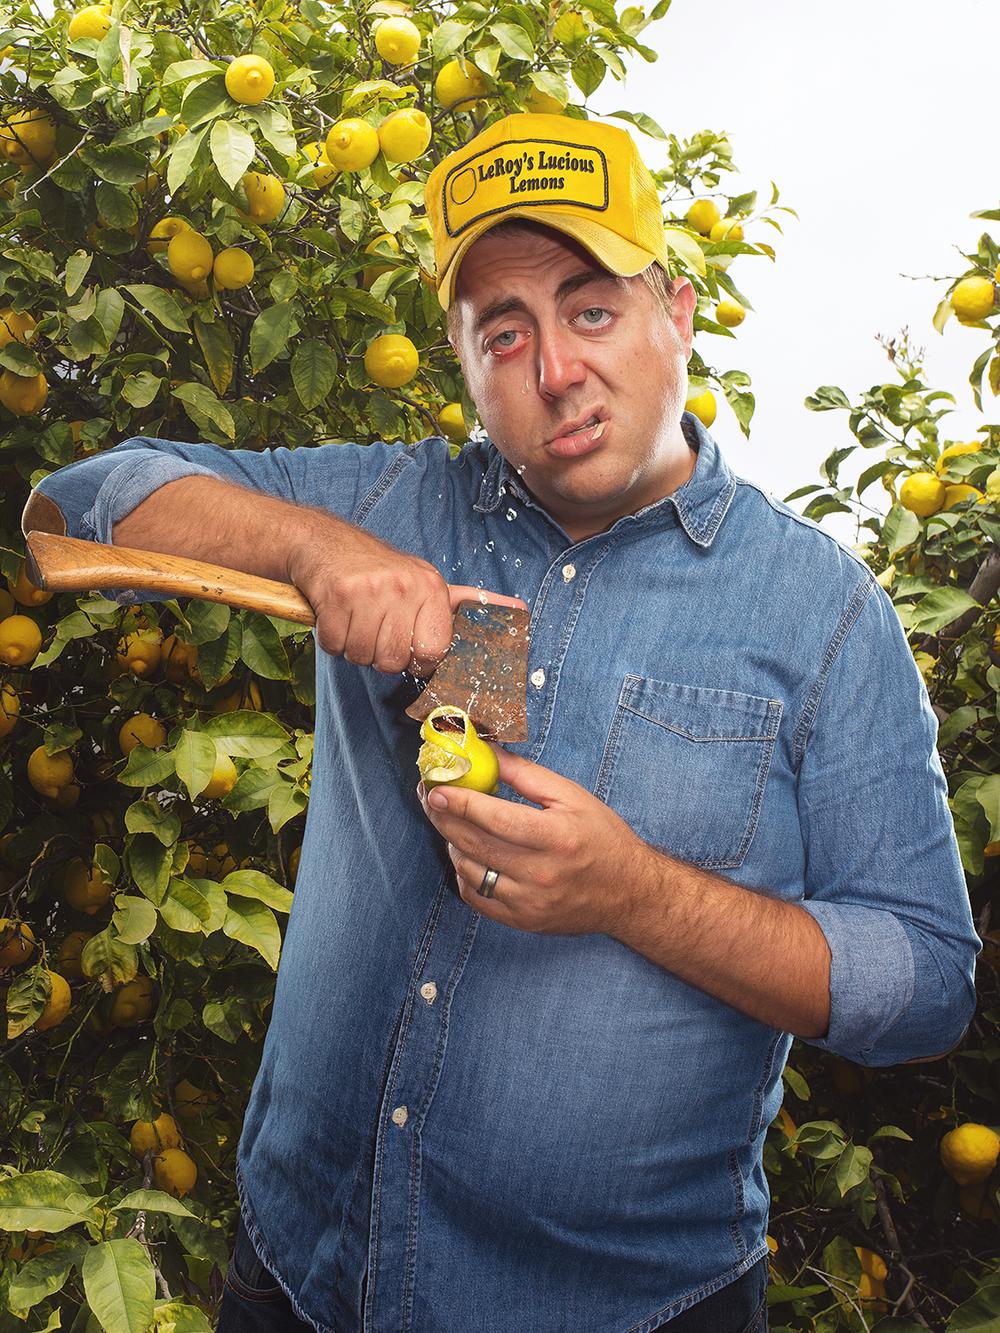 LeRoys_Lemons_2.jpg